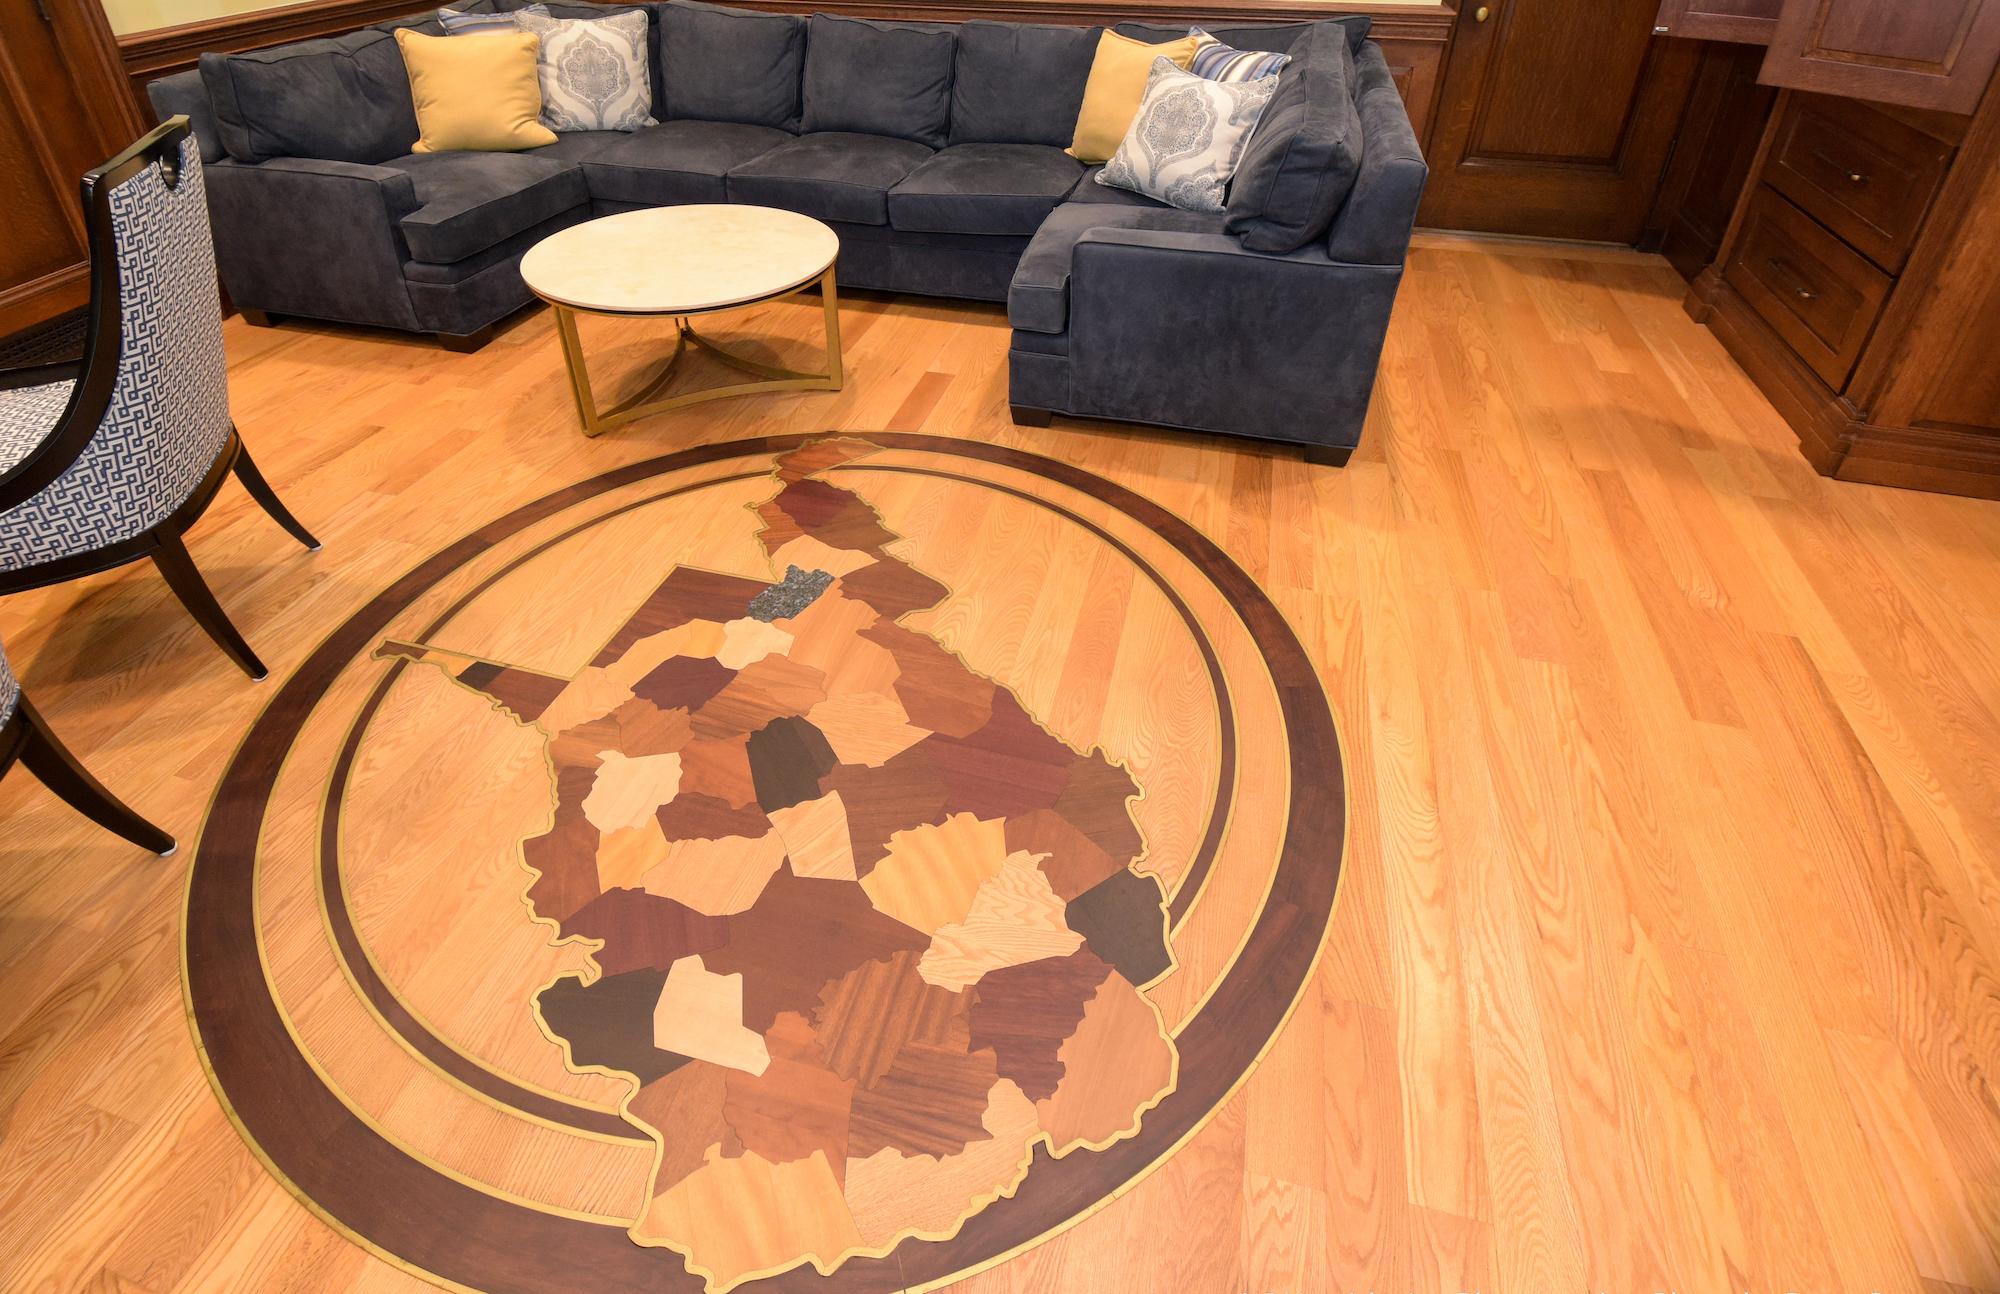 Stunning Wood Floor Inlay Part Of Wasteful Spending By WV - Medallion flooring distributor